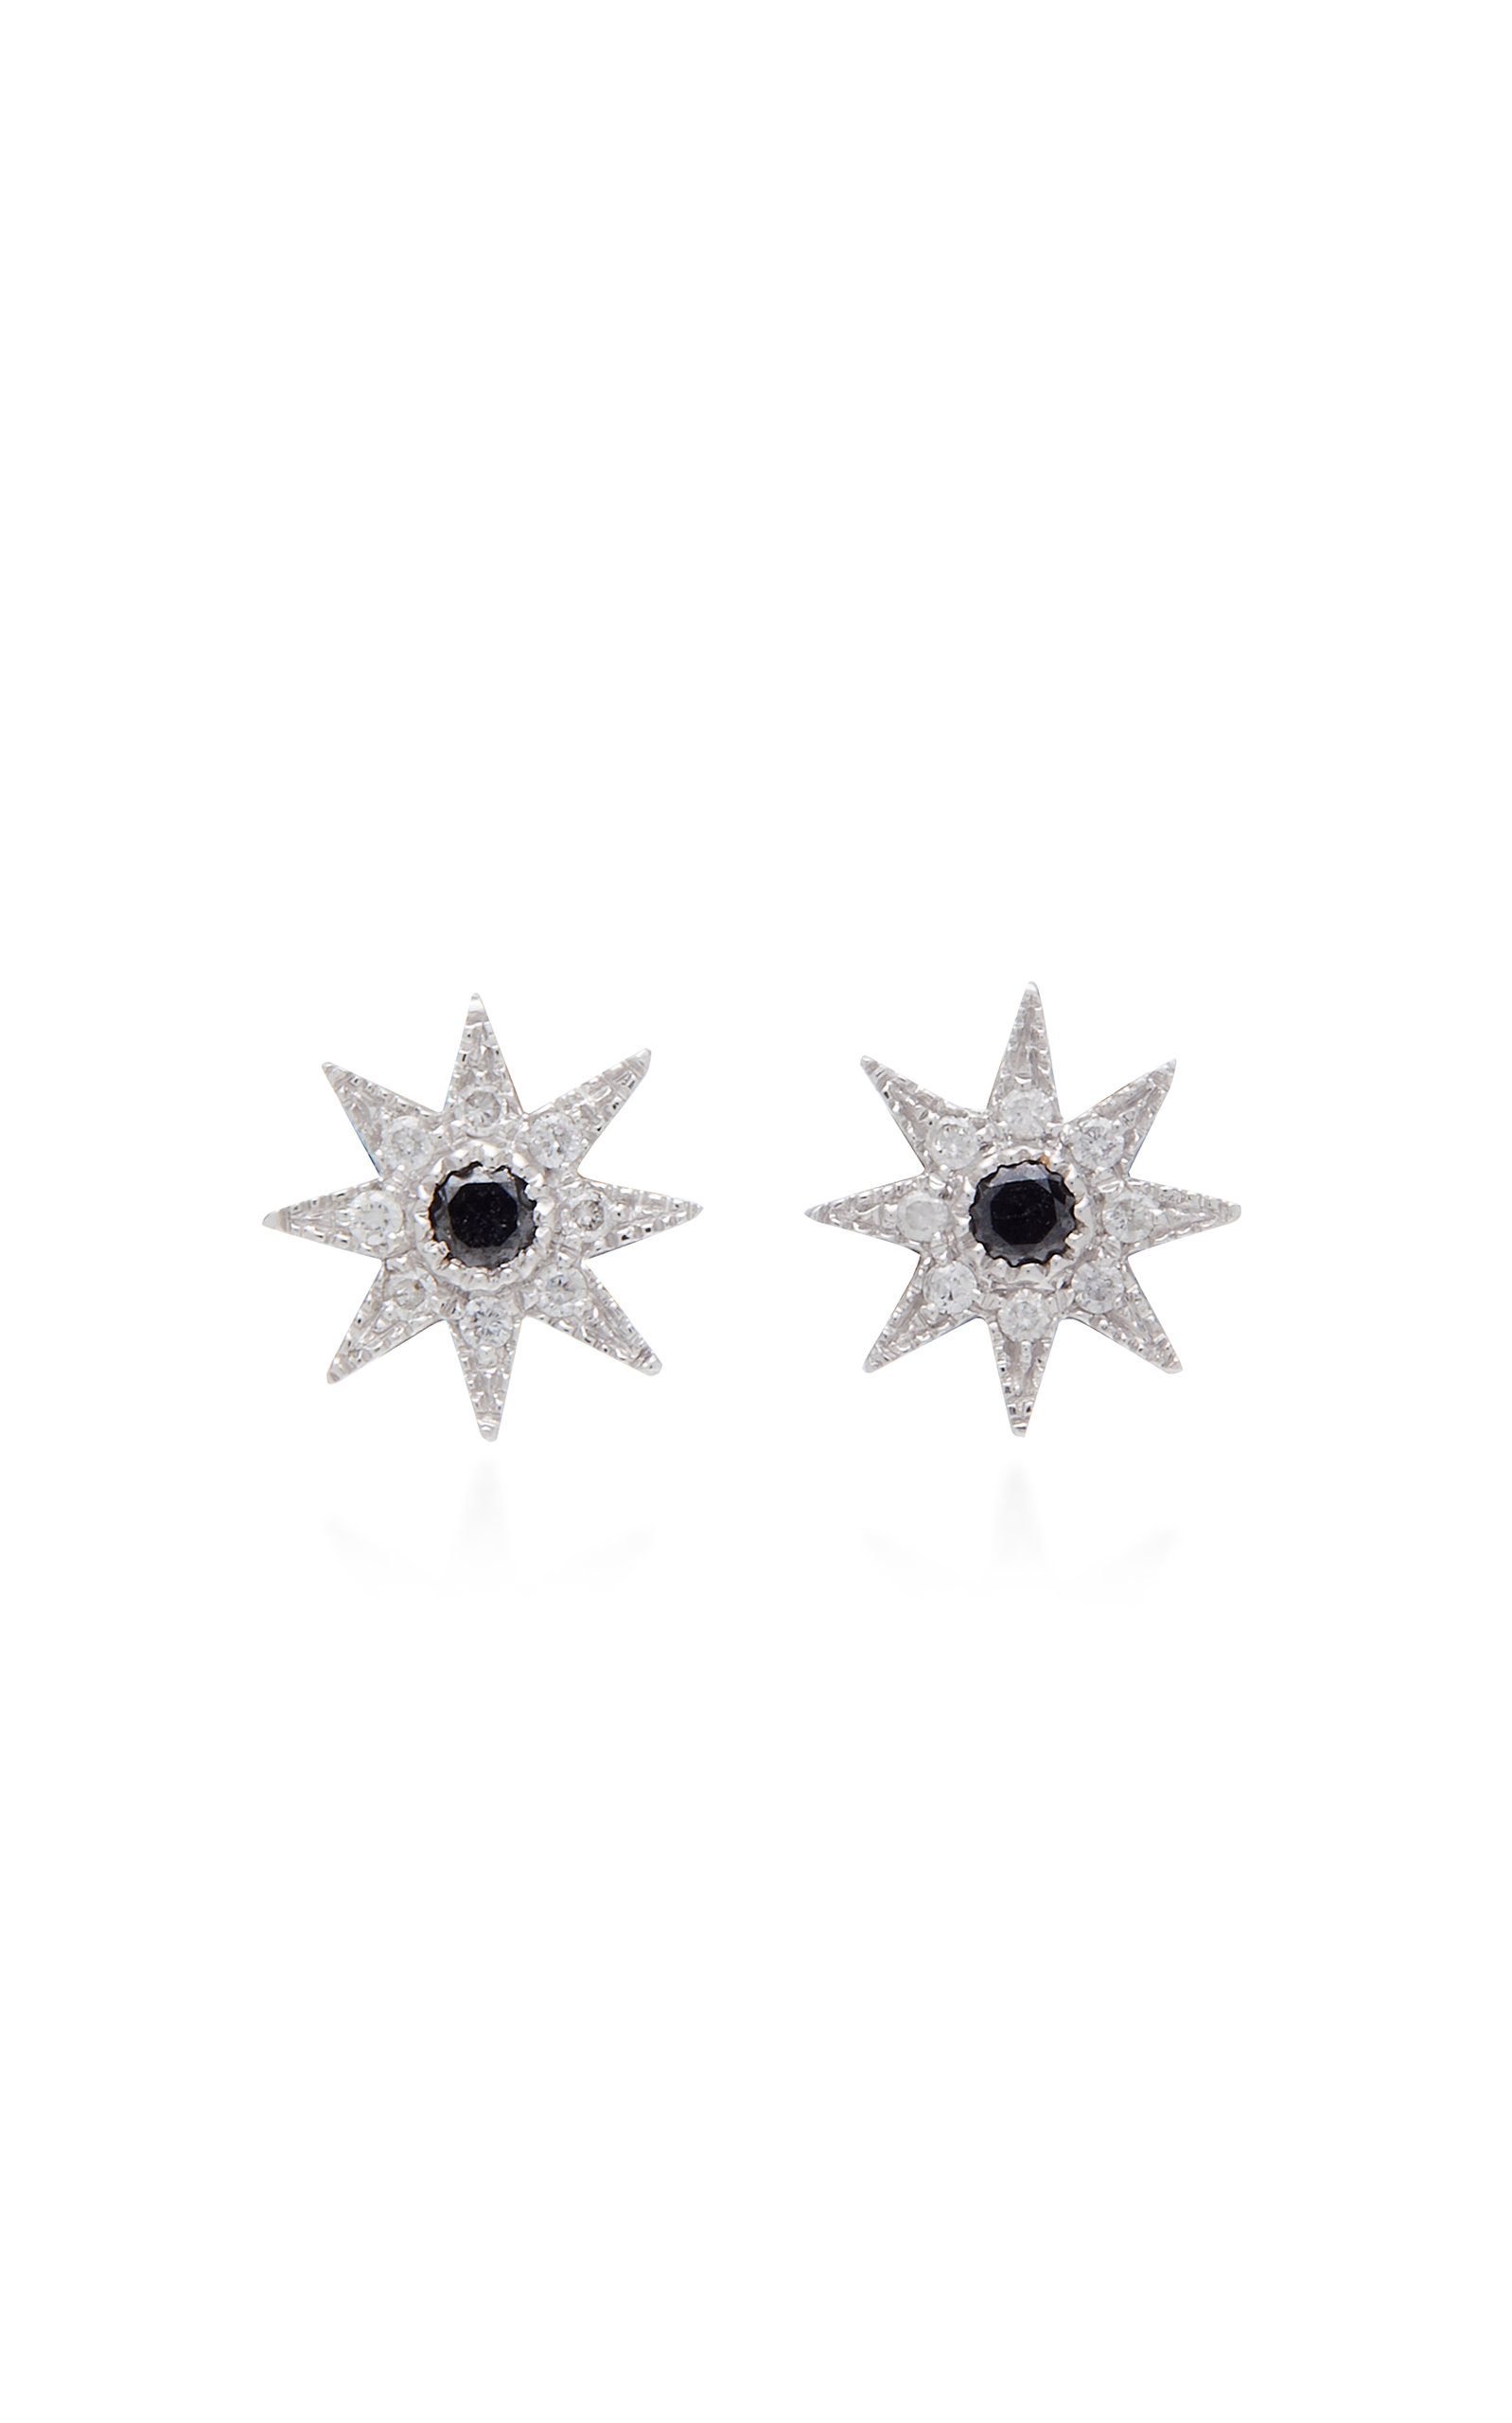 Colette Jewelry - Women's 18K White Gold and Diamond Earrings - White - Moda Operandi